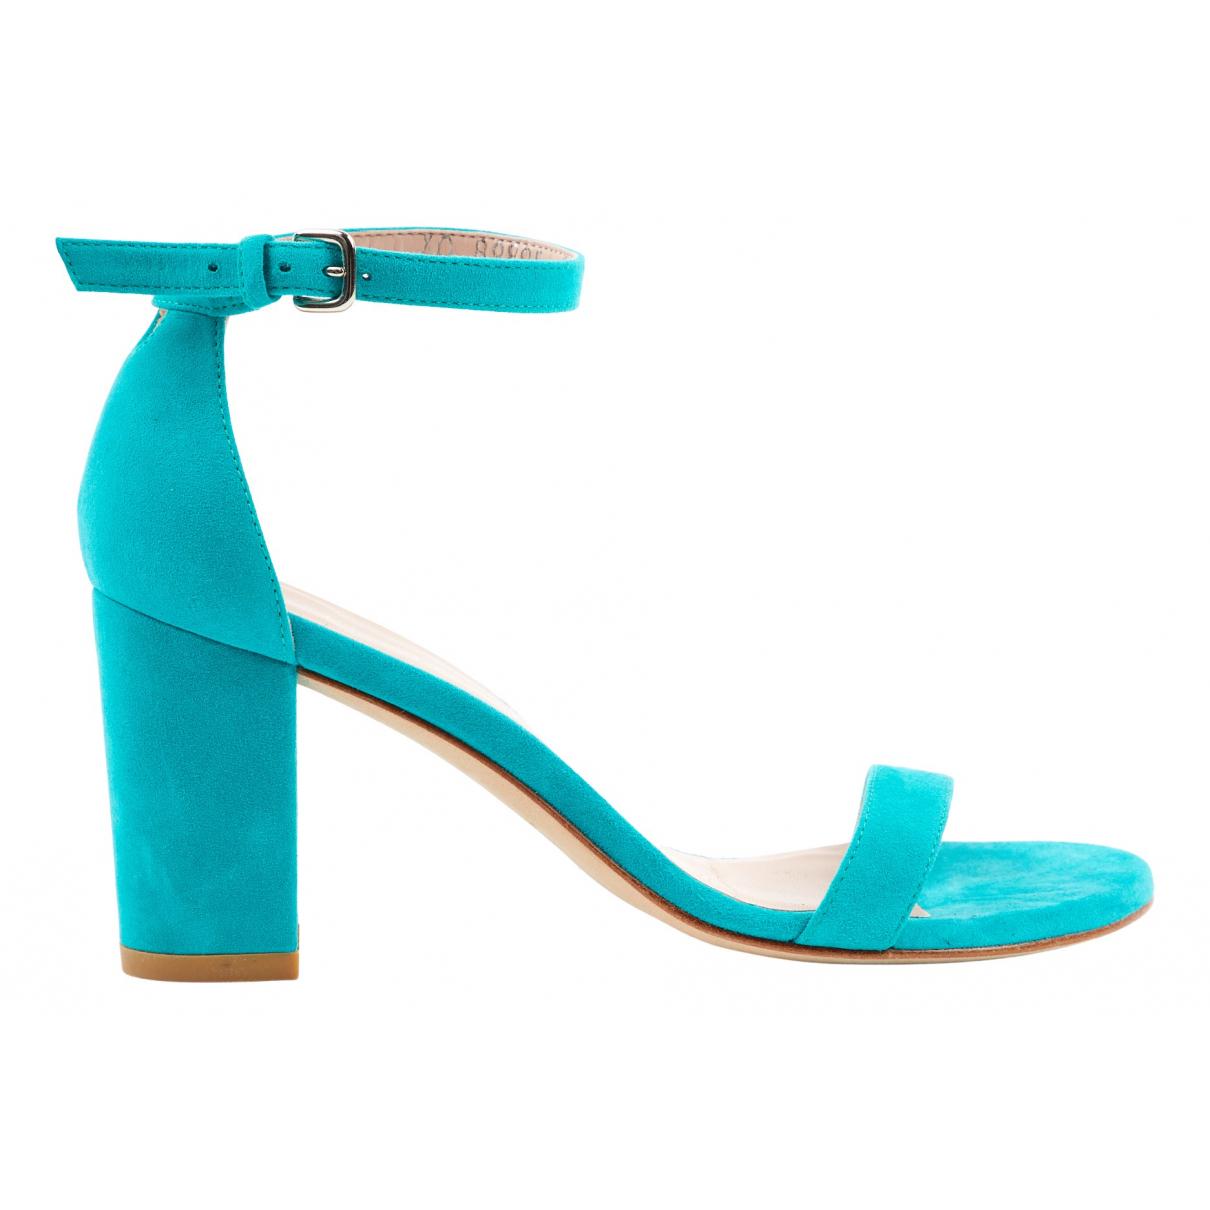 Stuart Weitzman N Turquoise Suede Sandals for Women 36 EU